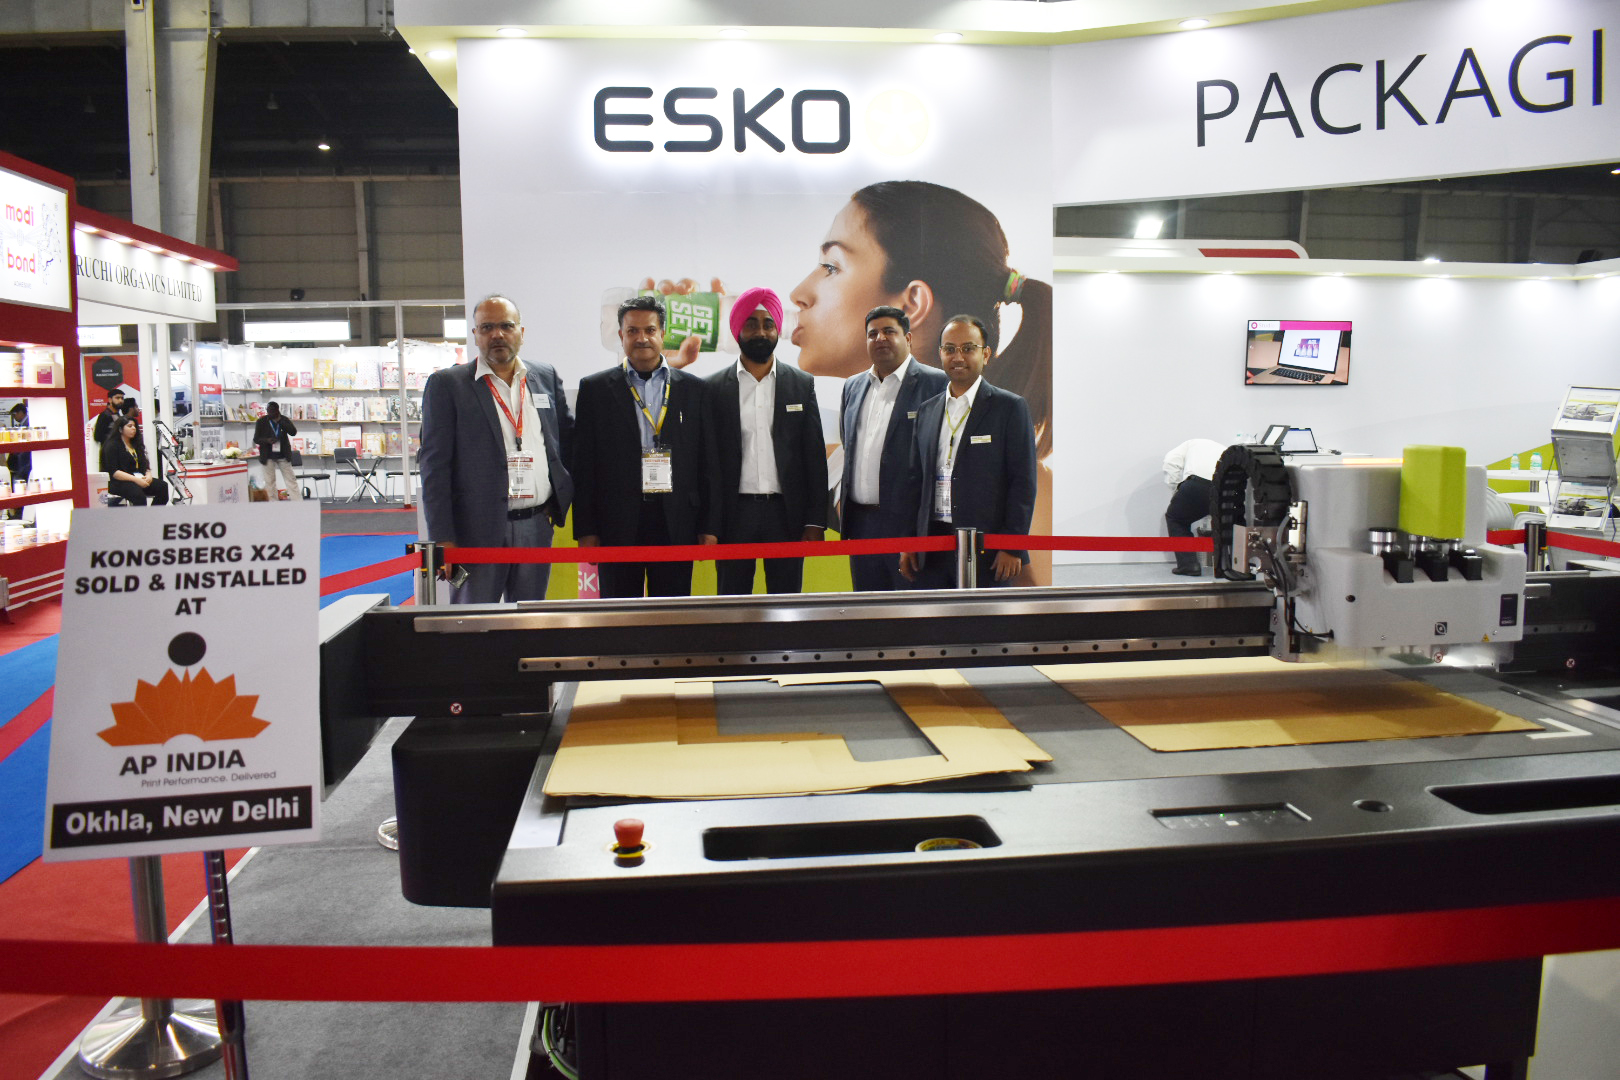 Esko announces sale of Kongsberg and Artios CAD at PrintPack India